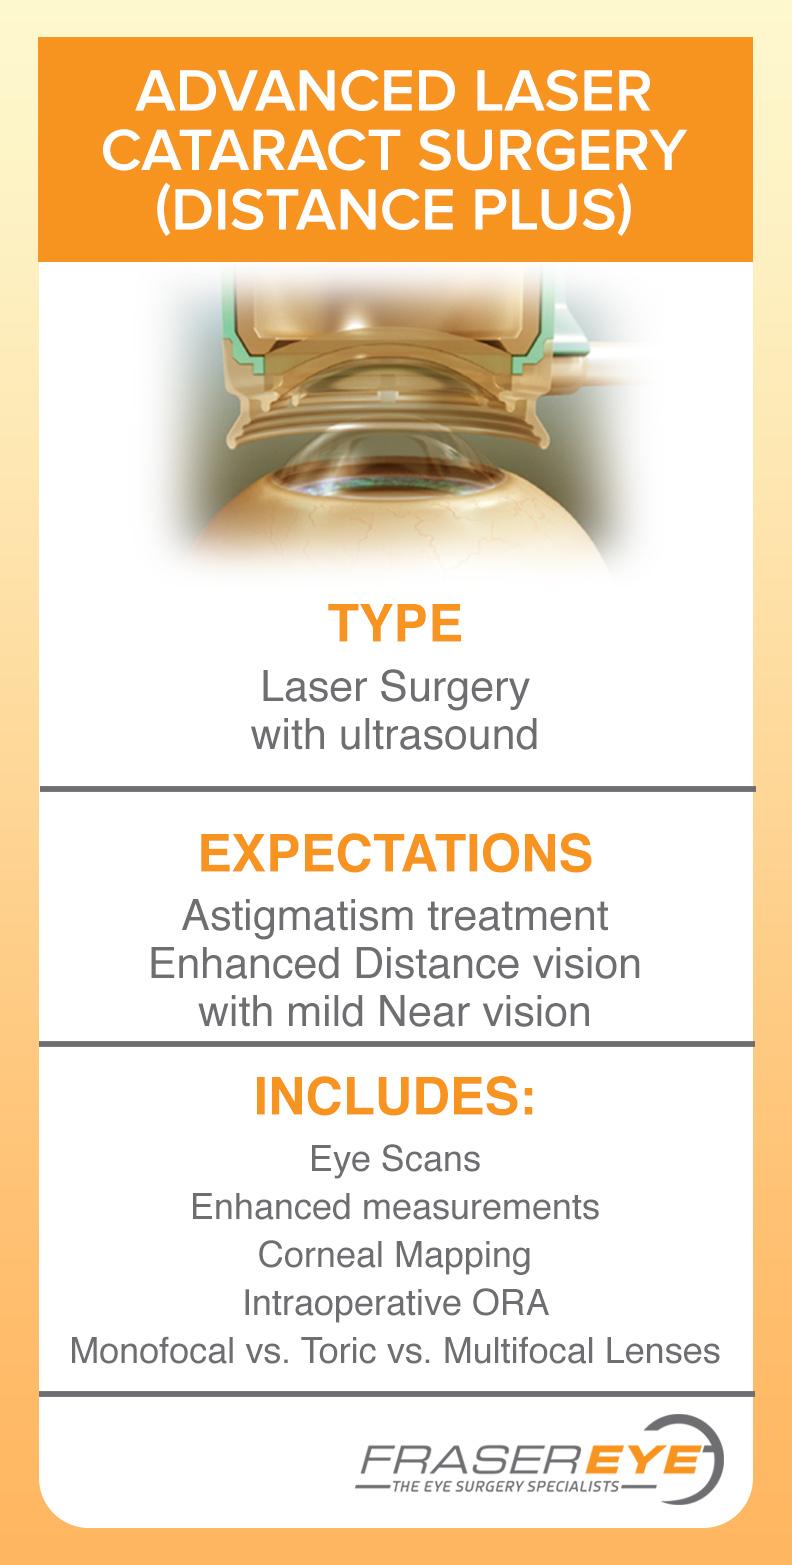 Advanced Laser Cataract surgery (distance plus)